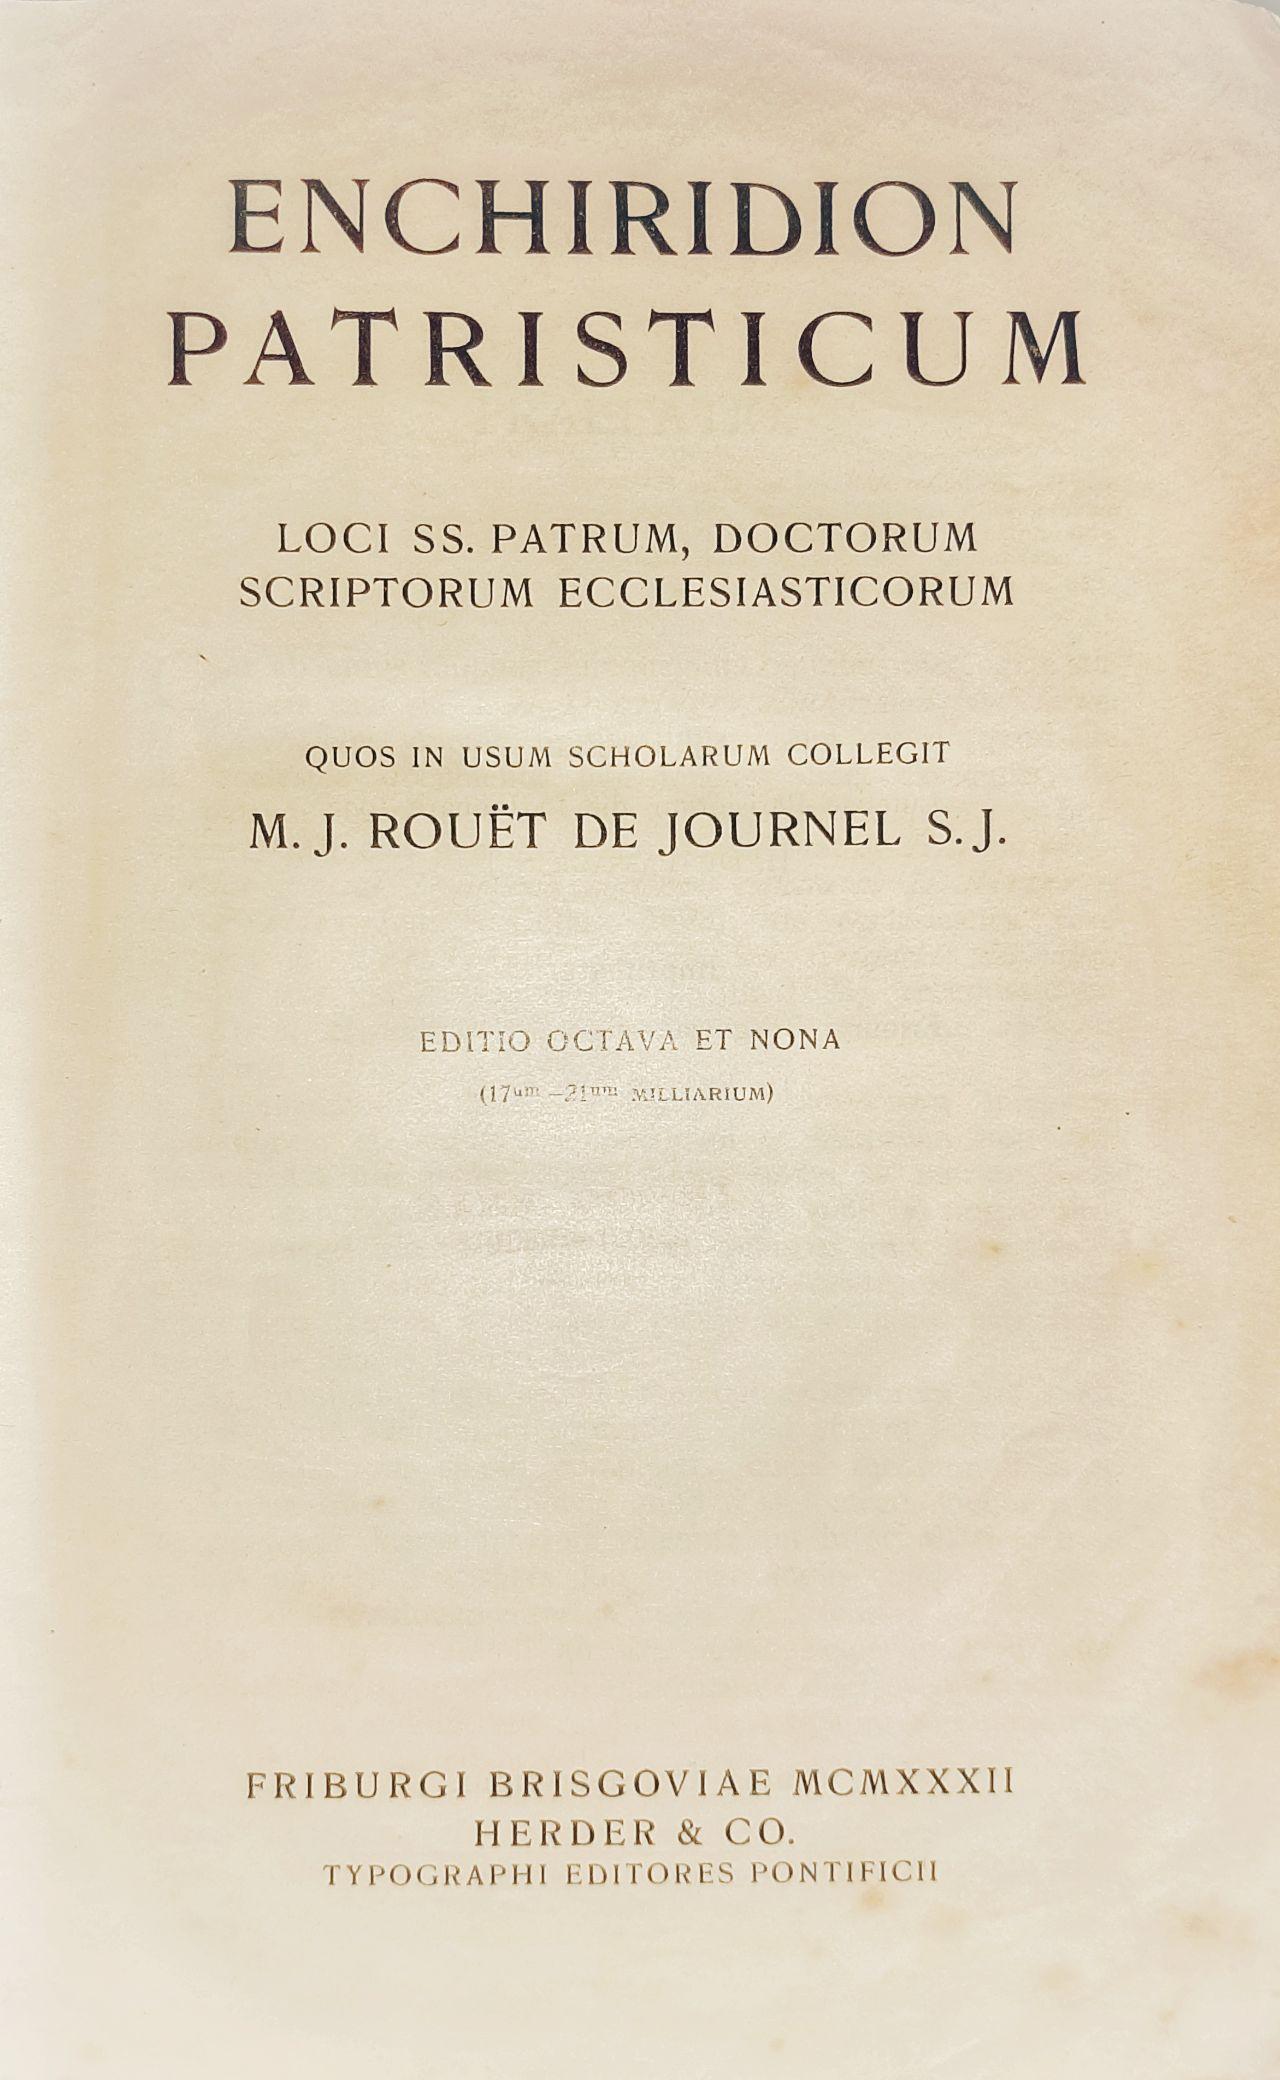 Enchiridion patristicum. Perioada Triodului (II)